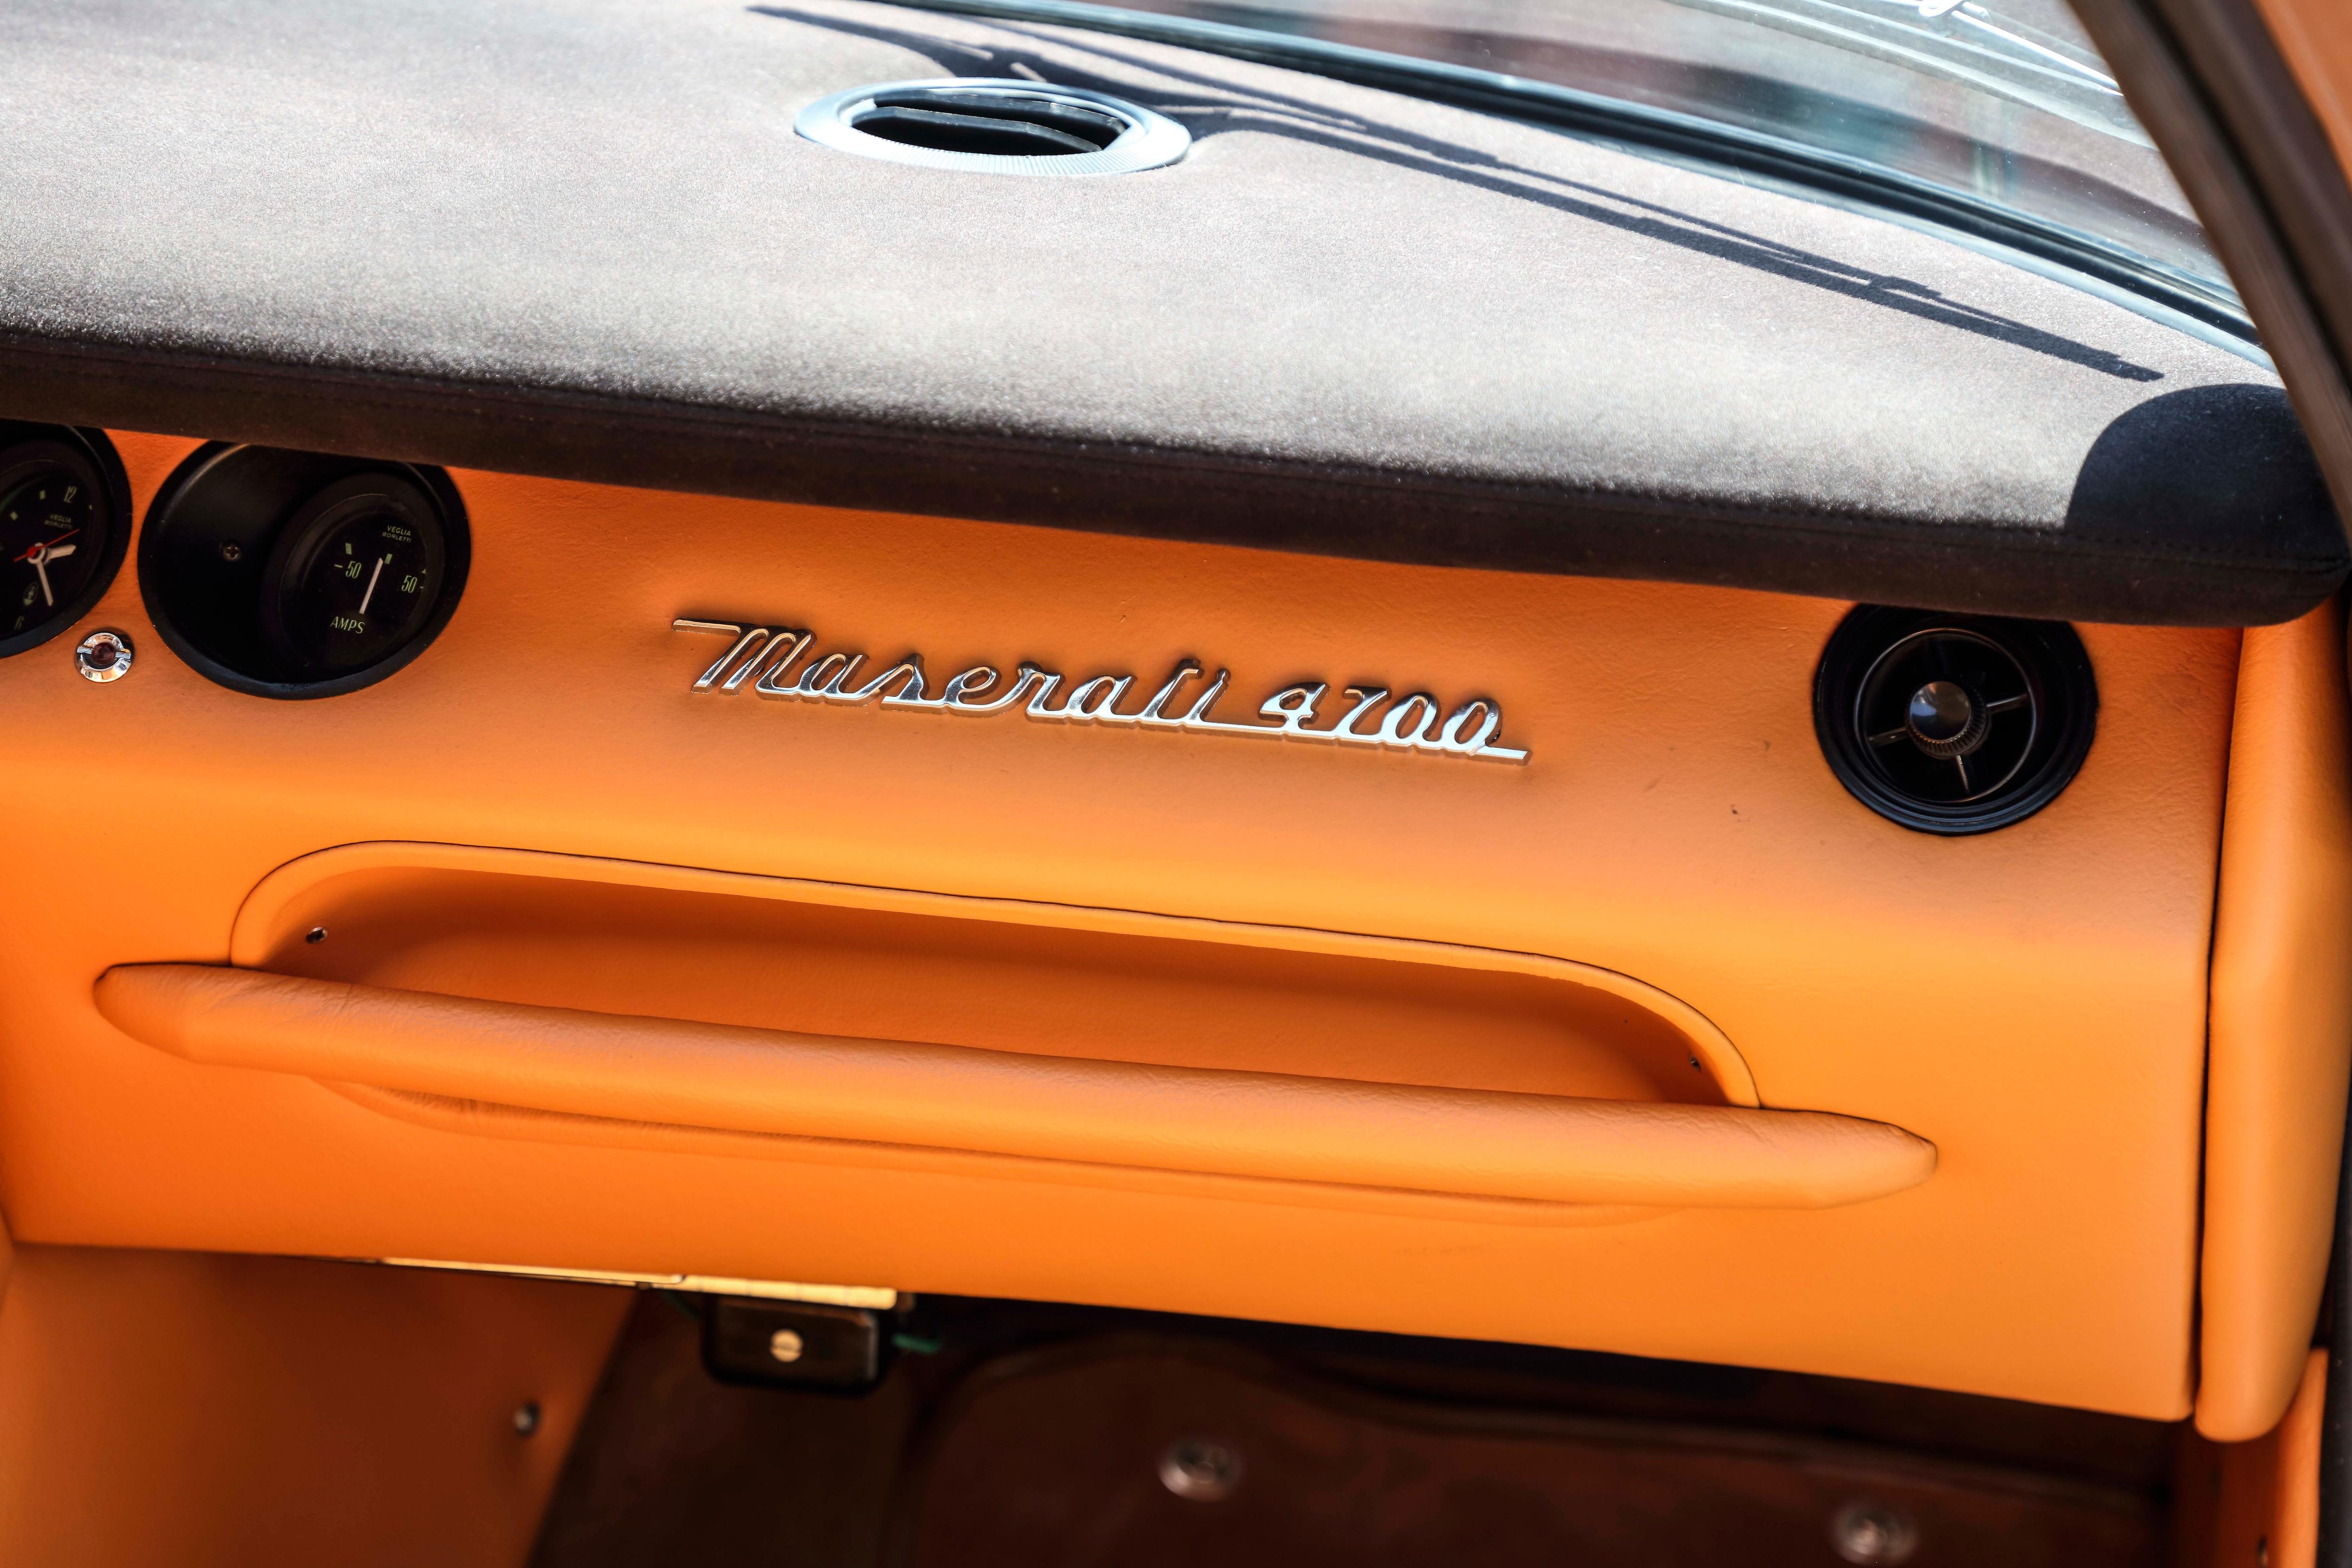 Luxury + Performance + Maserati = One Cool Ride | Automobile Magazine